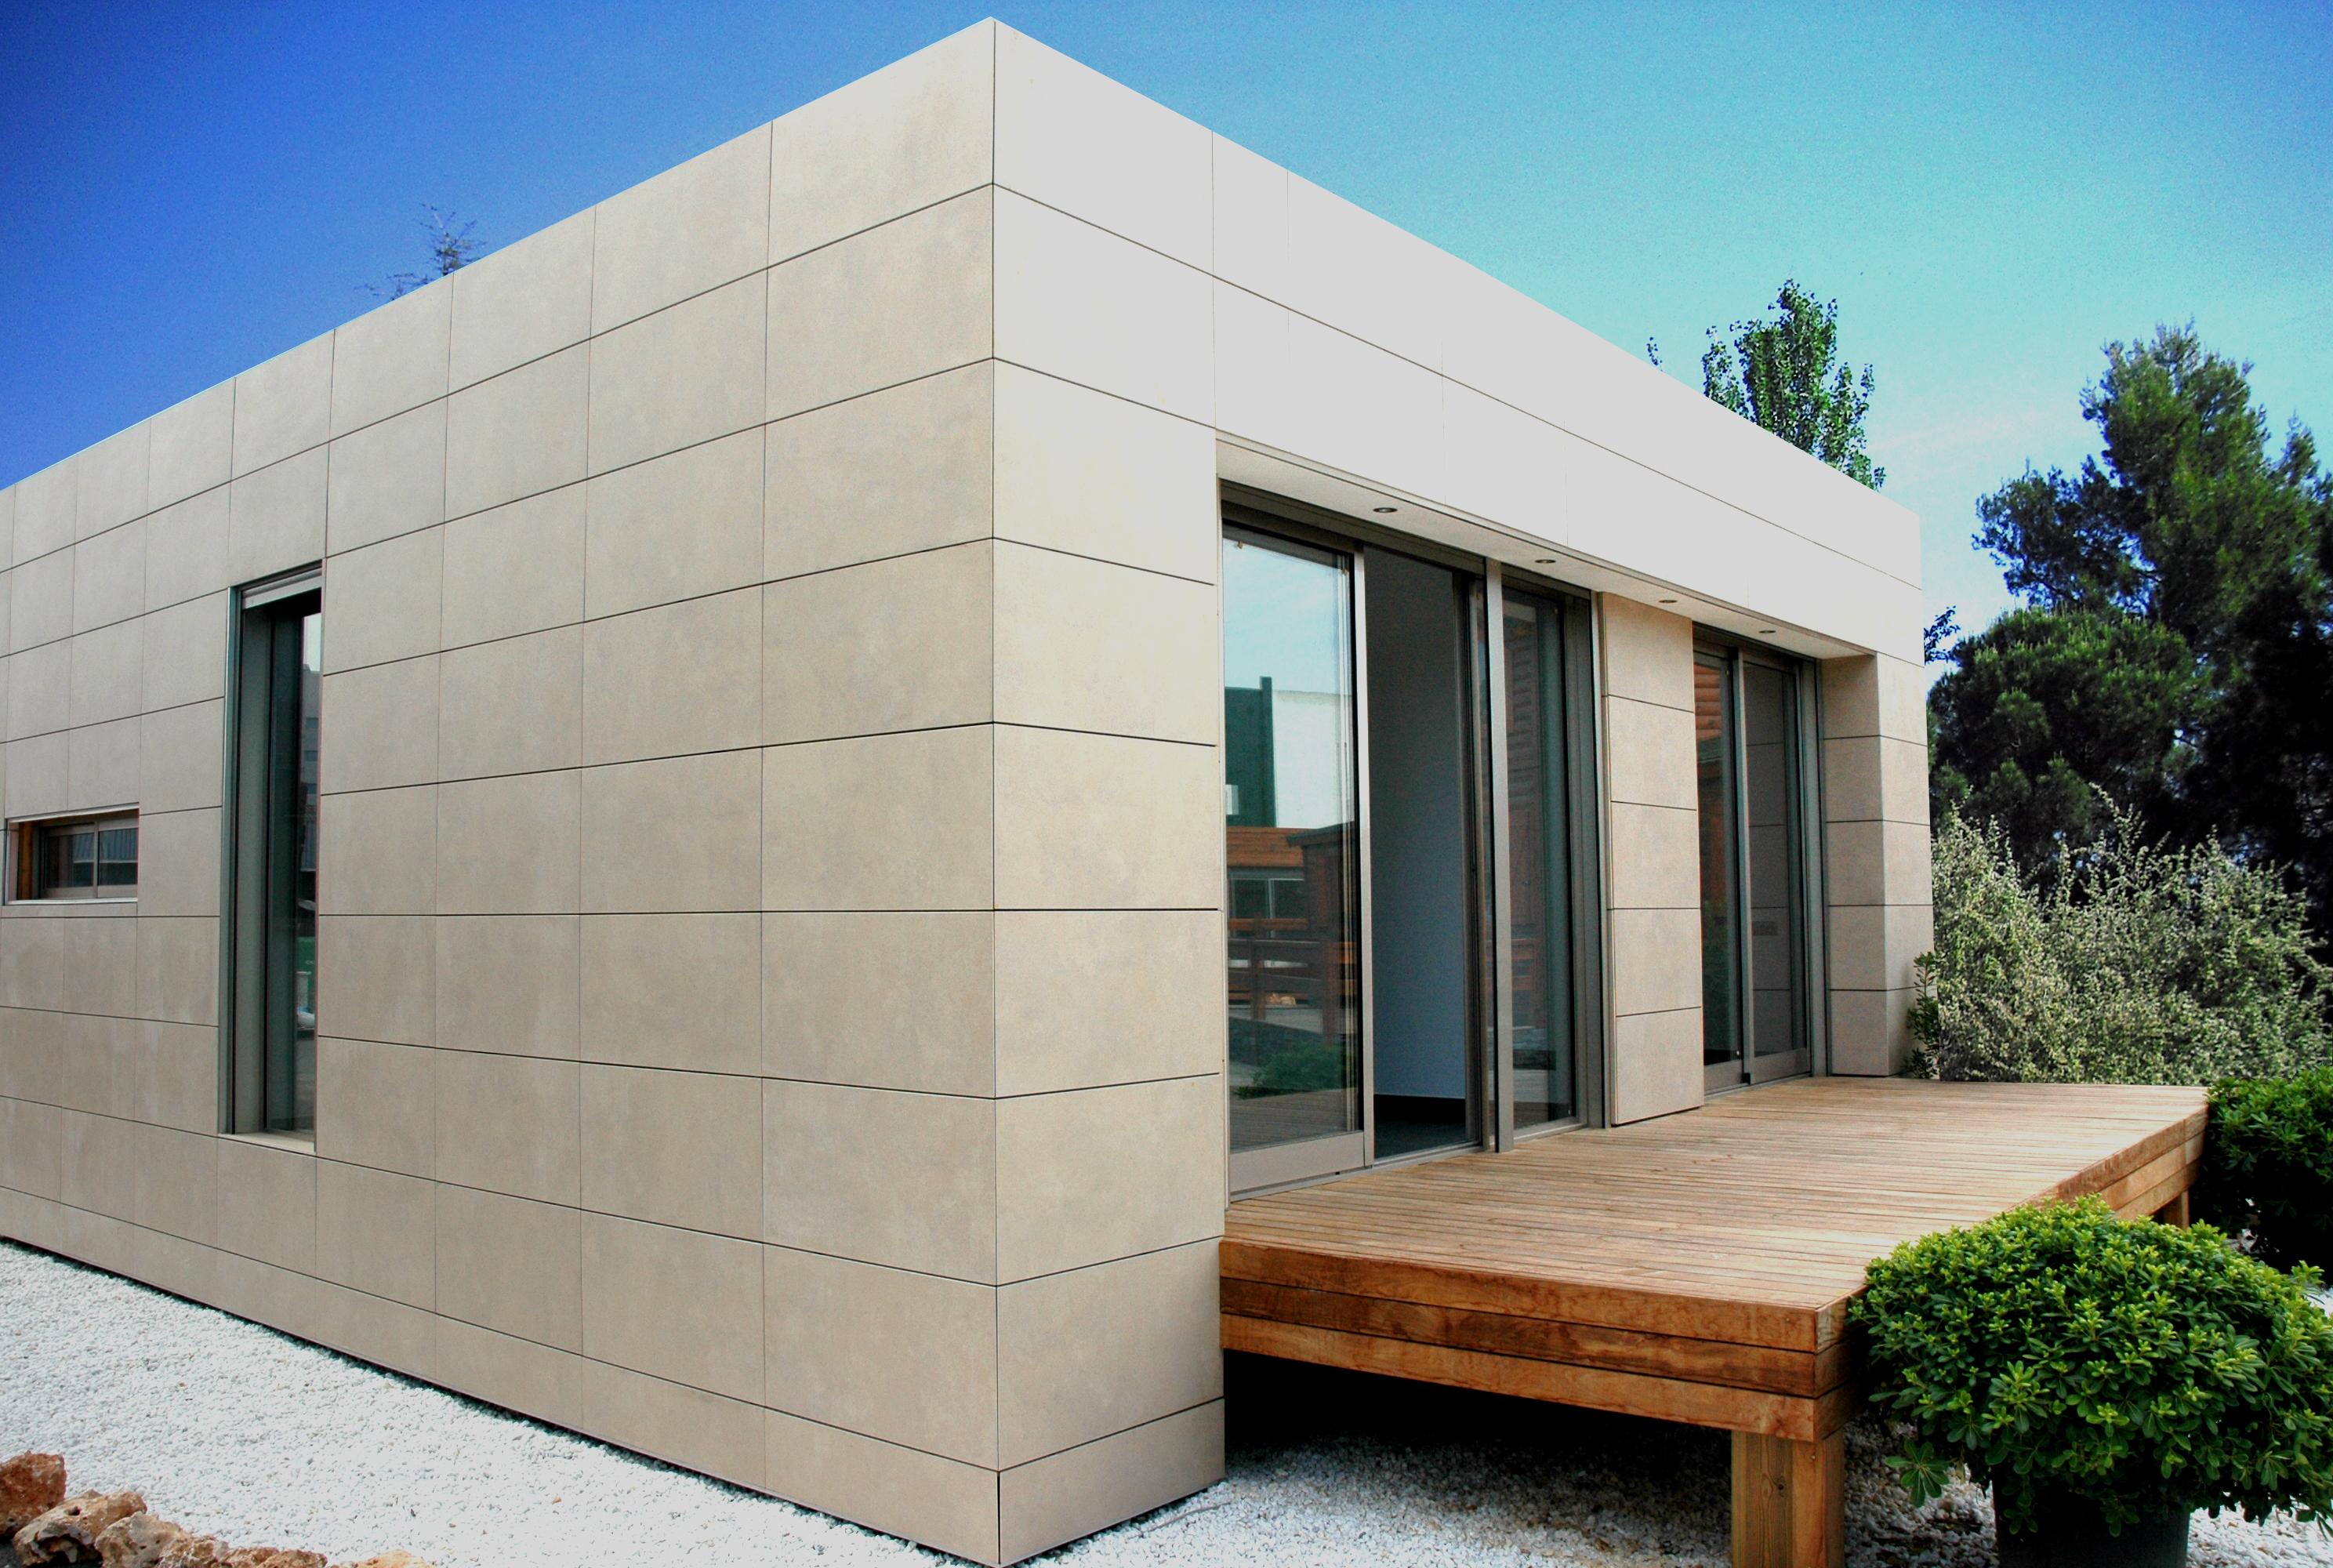 Casa de madera casas prefabricadas foto casa modelo alpina - Modelos de casas prefabricadas ...